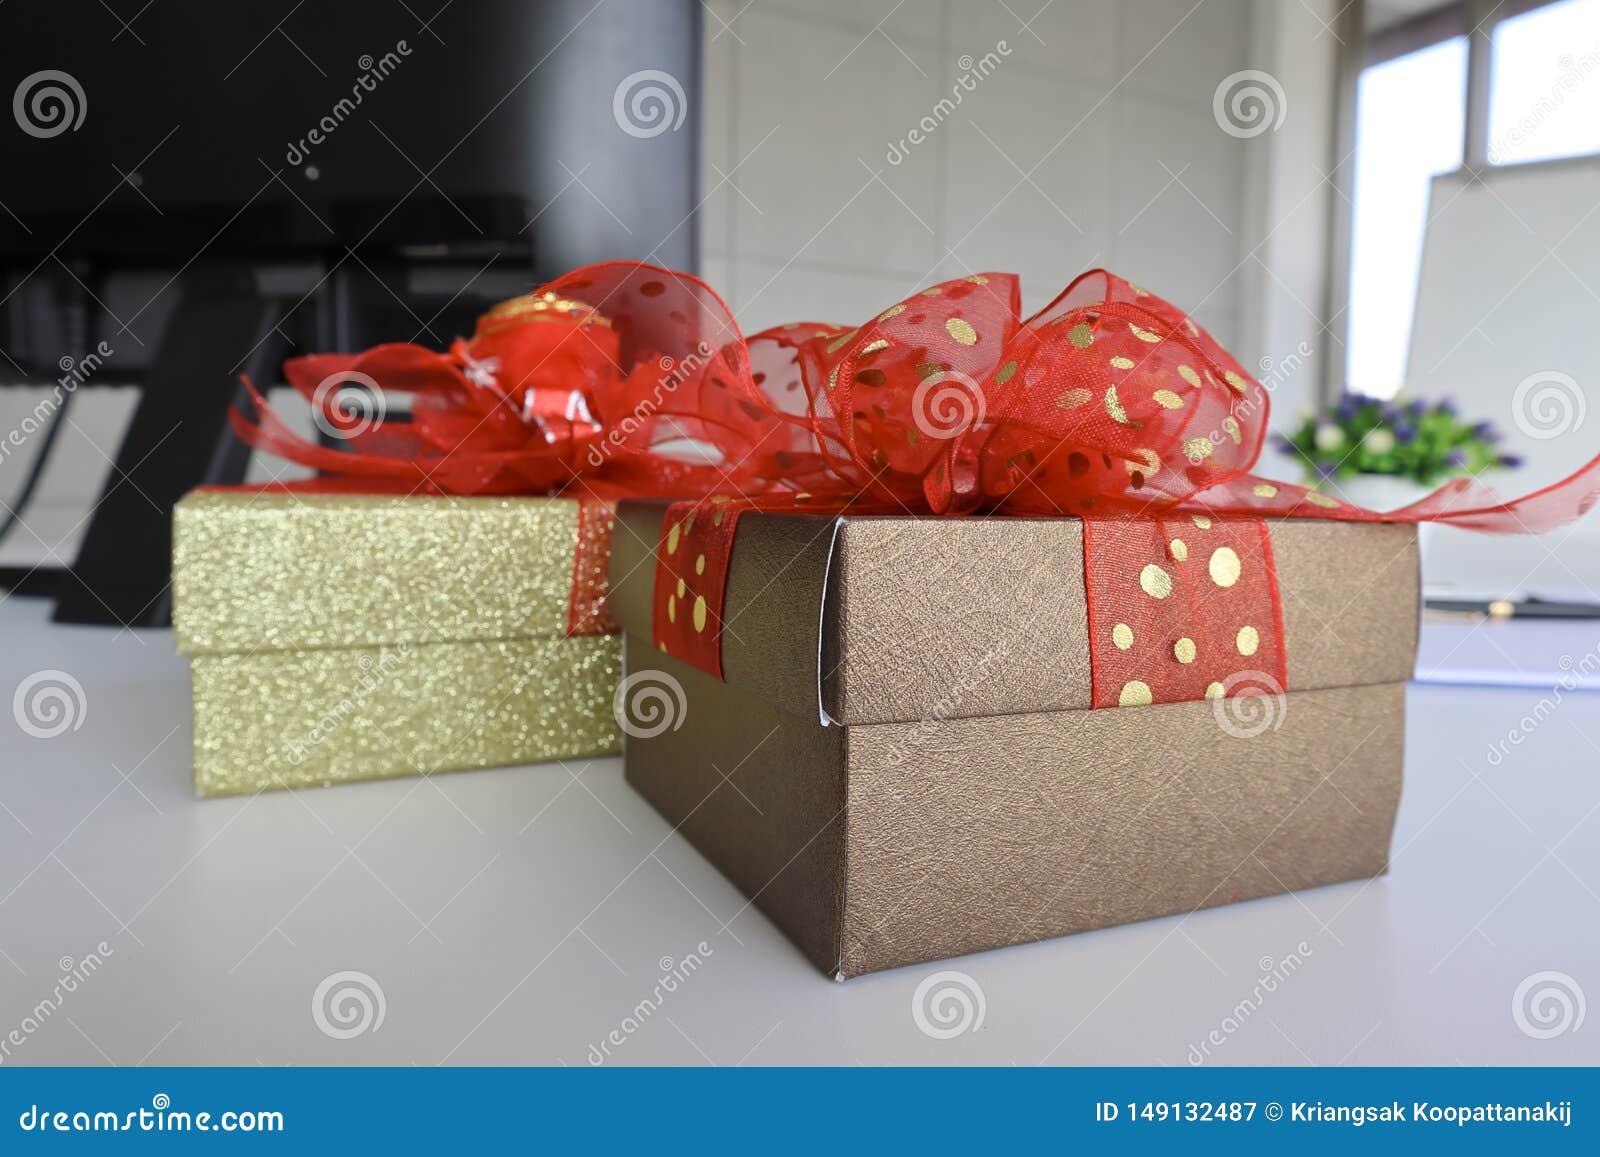 Two gift boexes on the white desk